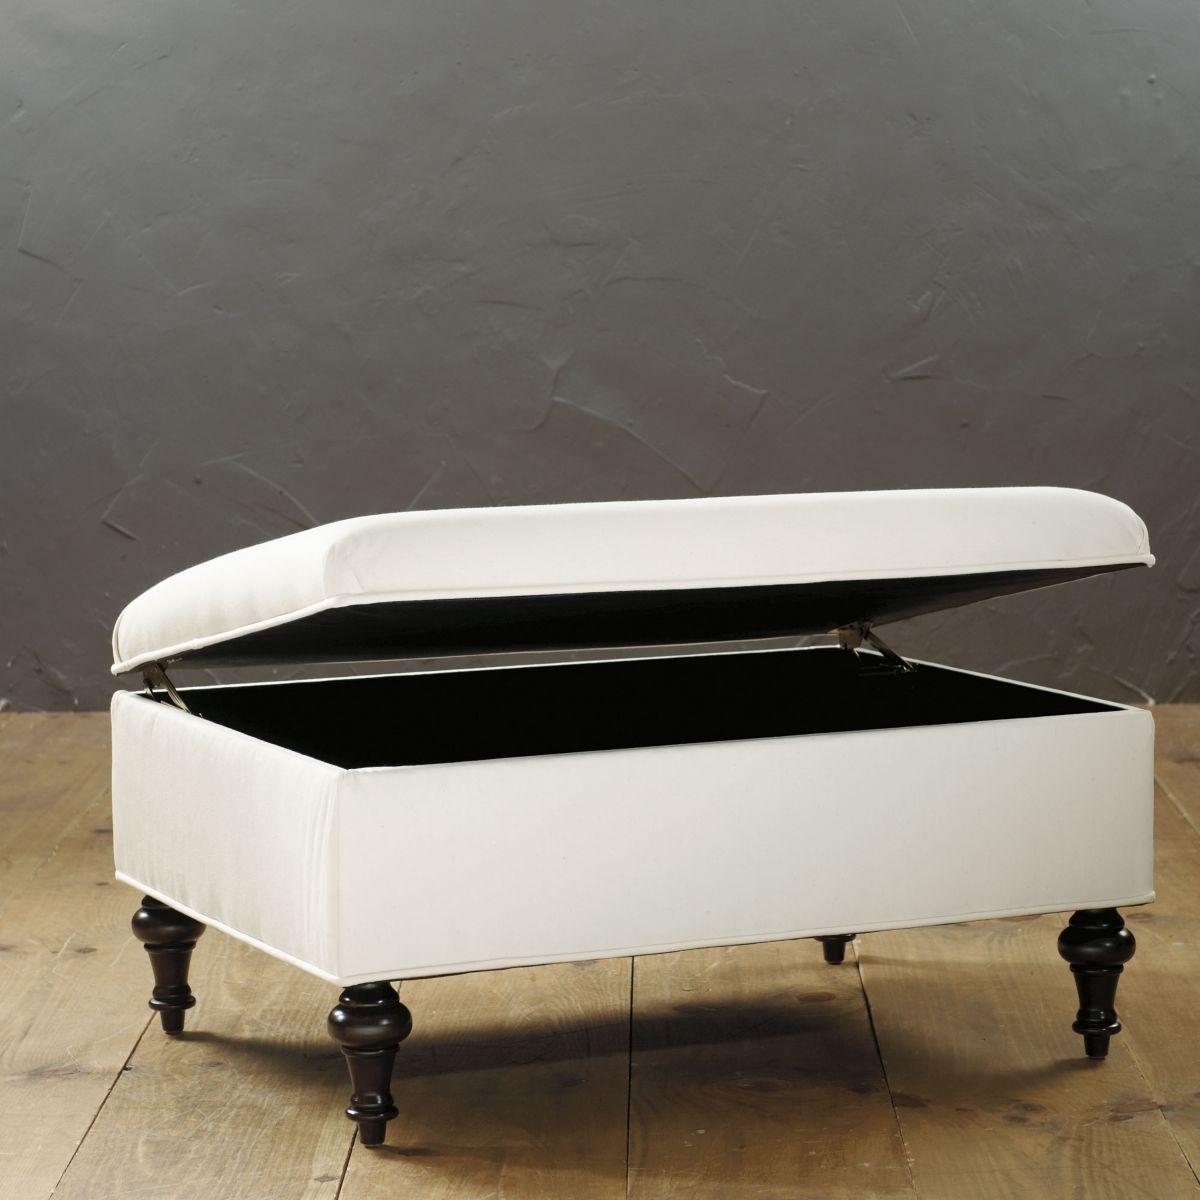 Super Tailored Storage Ottoman Ballard Designs Things I Want Short Links Chair Design For Home Short Linksinfo